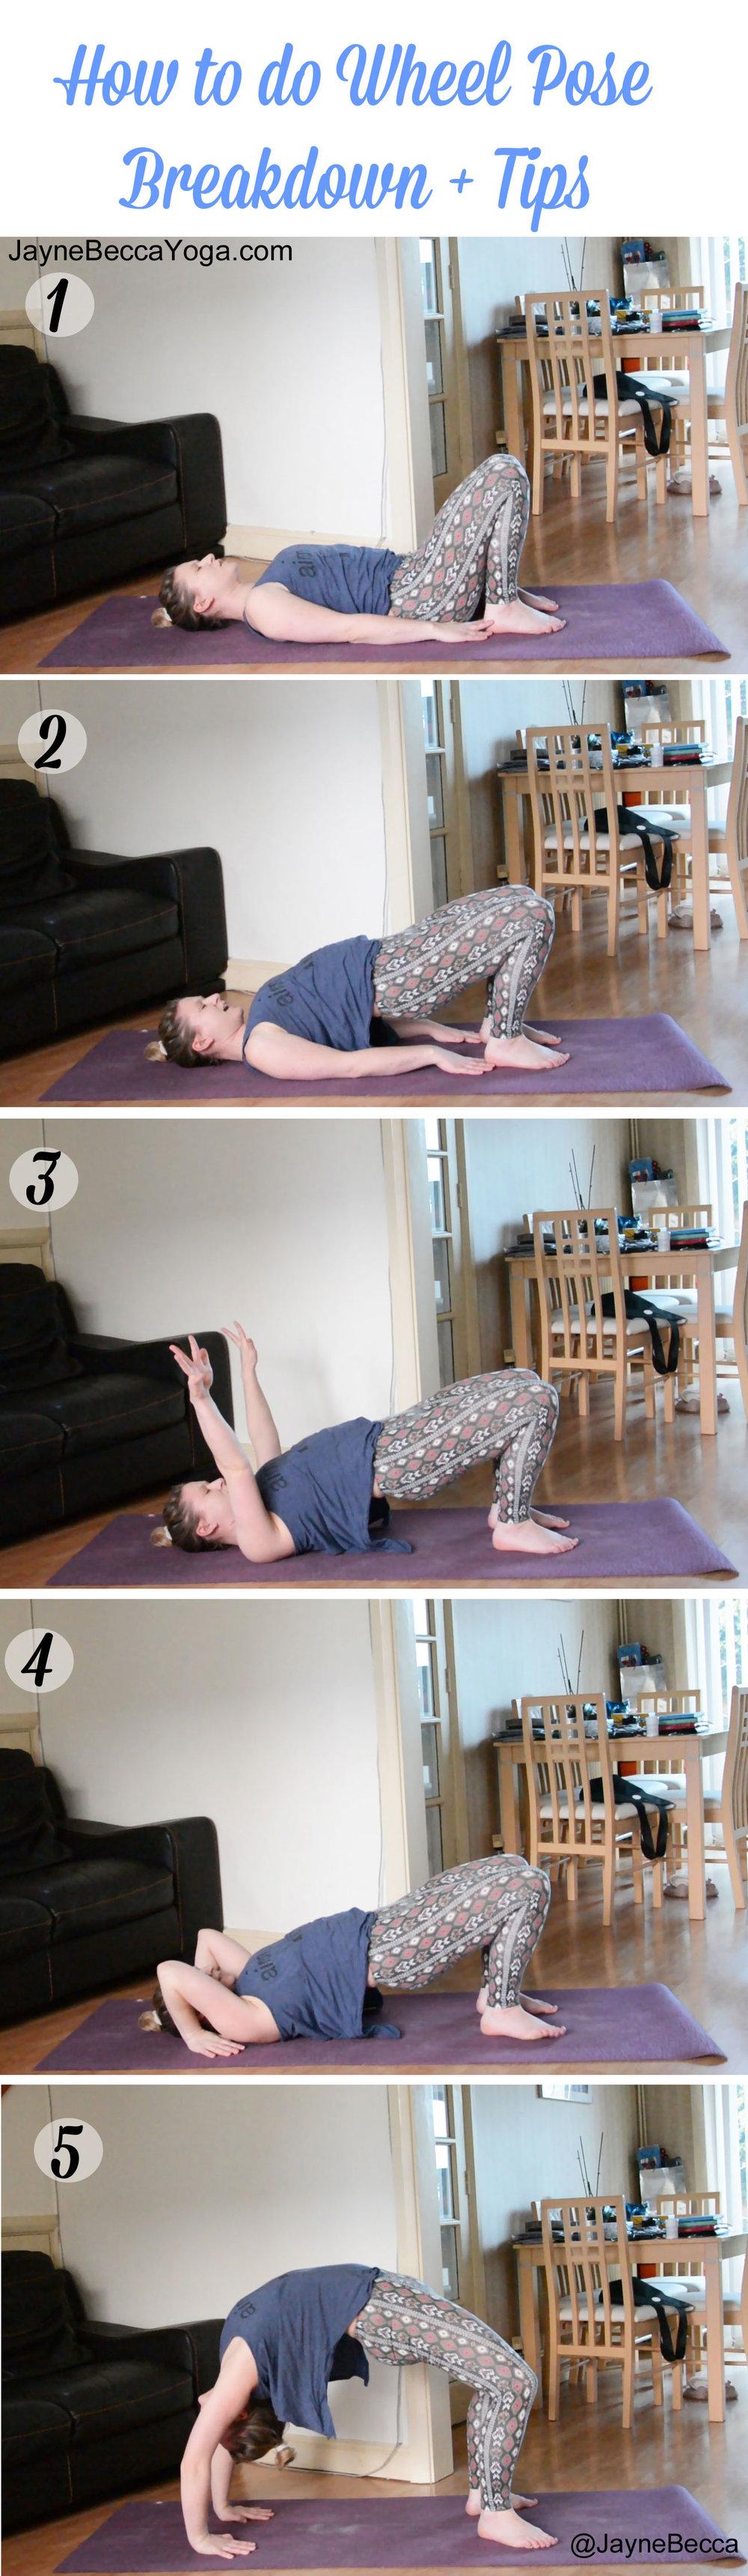 How to do Wheel Pose - Jayne Becca Yoga